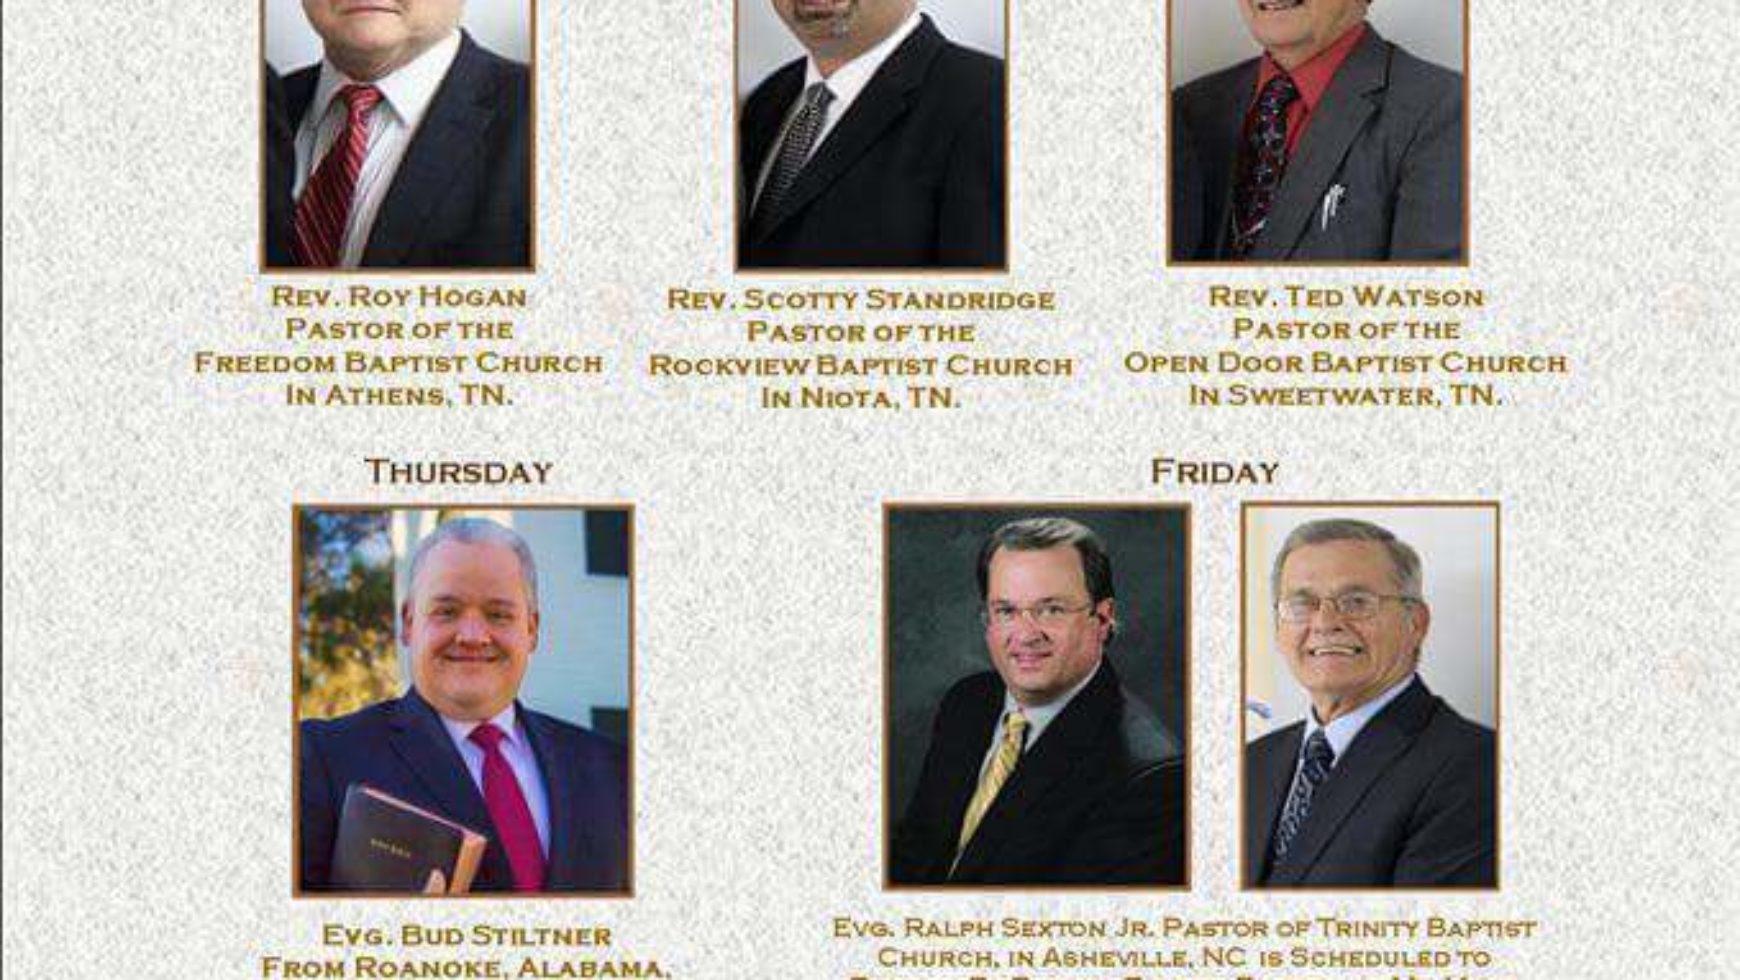 Area Meeting: Community Revival – Mt. Verd Baptist Church – Athens, Tn